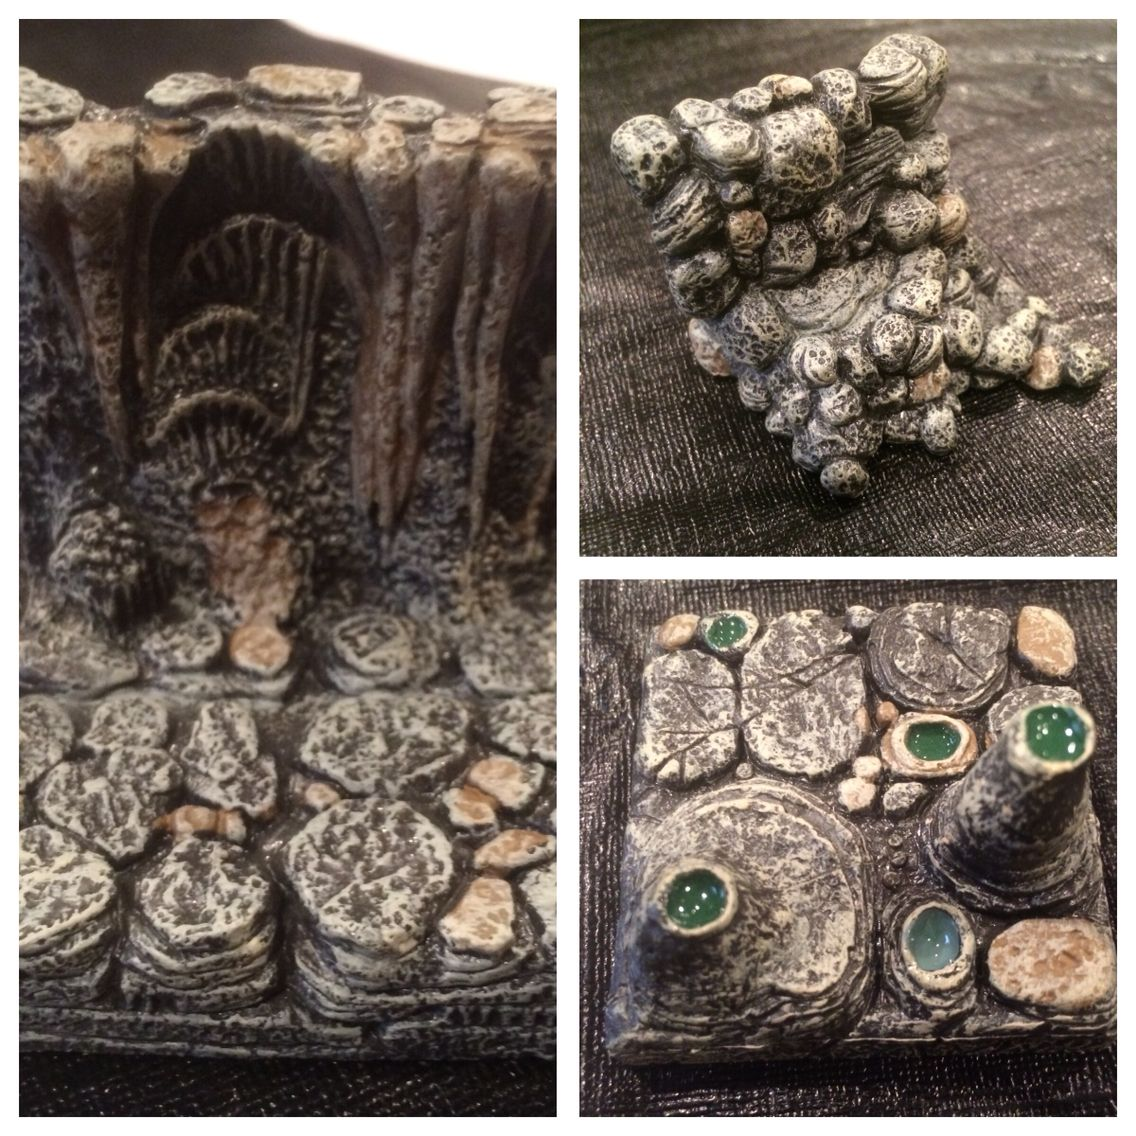 Terrain Home Decor: Home Decor, Decor, Miniatures